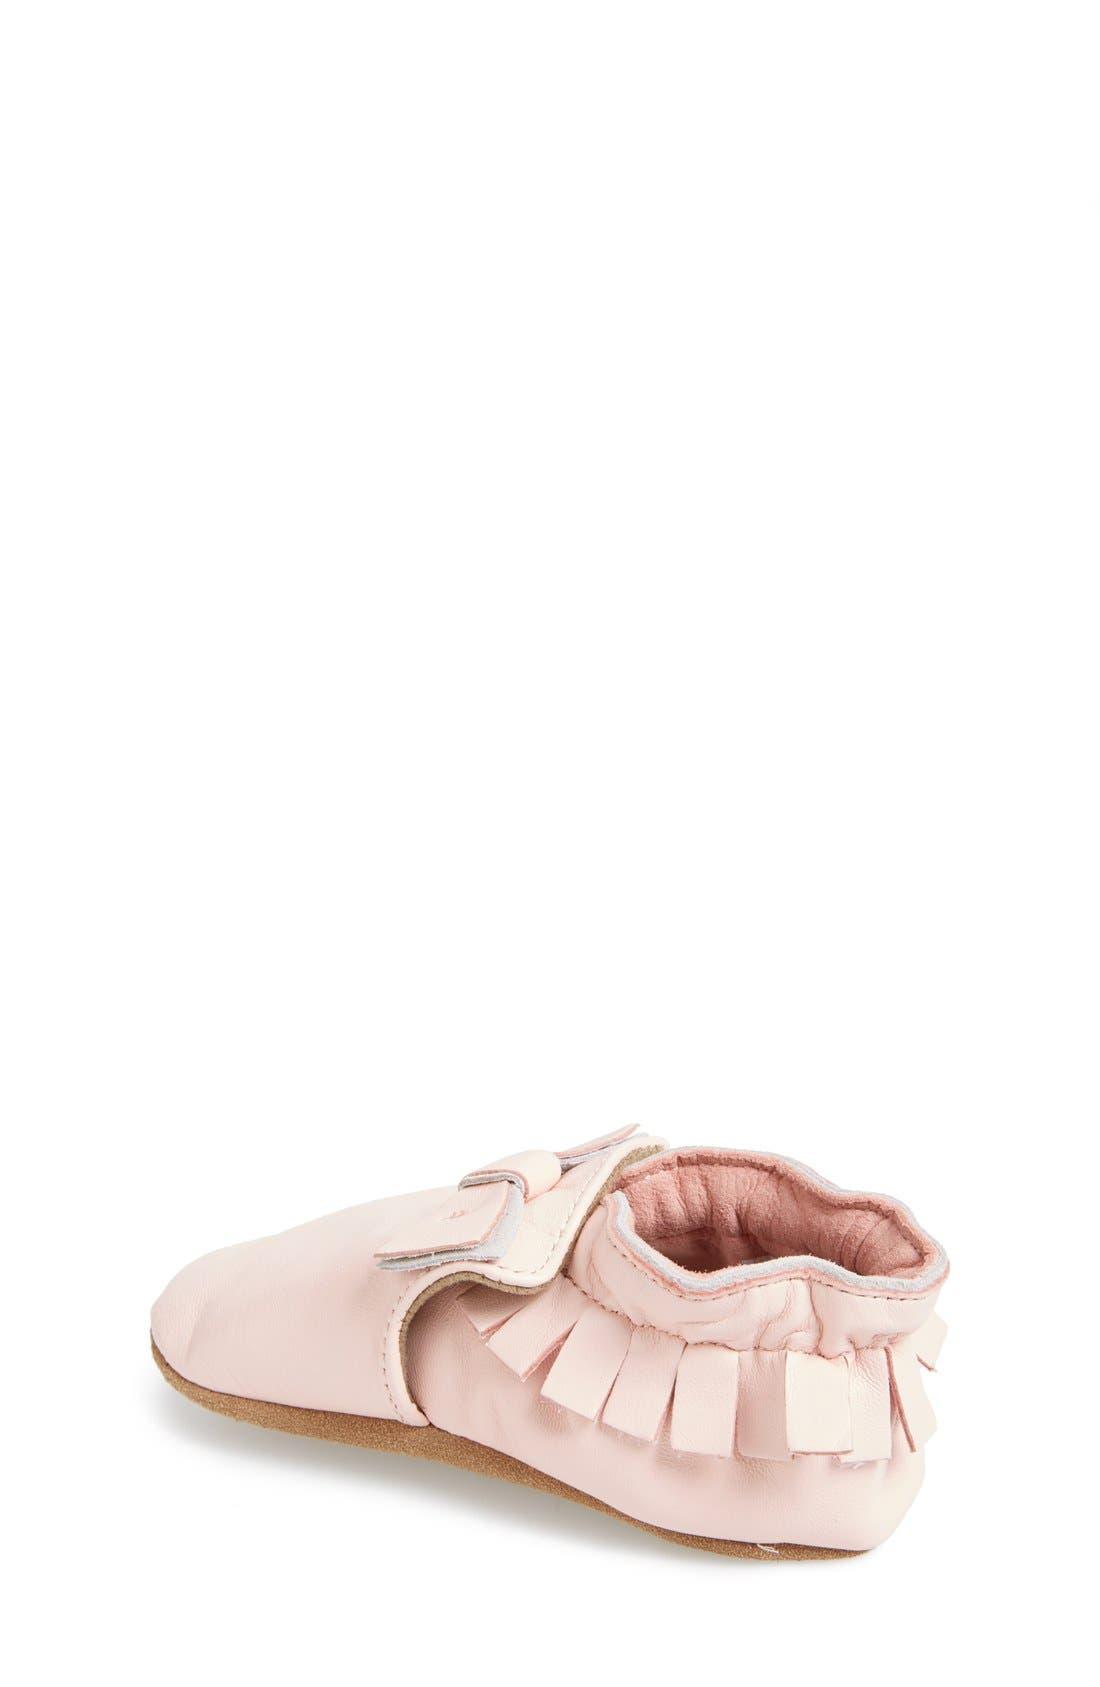 'Maggie Moccasin' Crib Shoe,                             Alternate thumbnail 2, color,                             PASTEL PINK